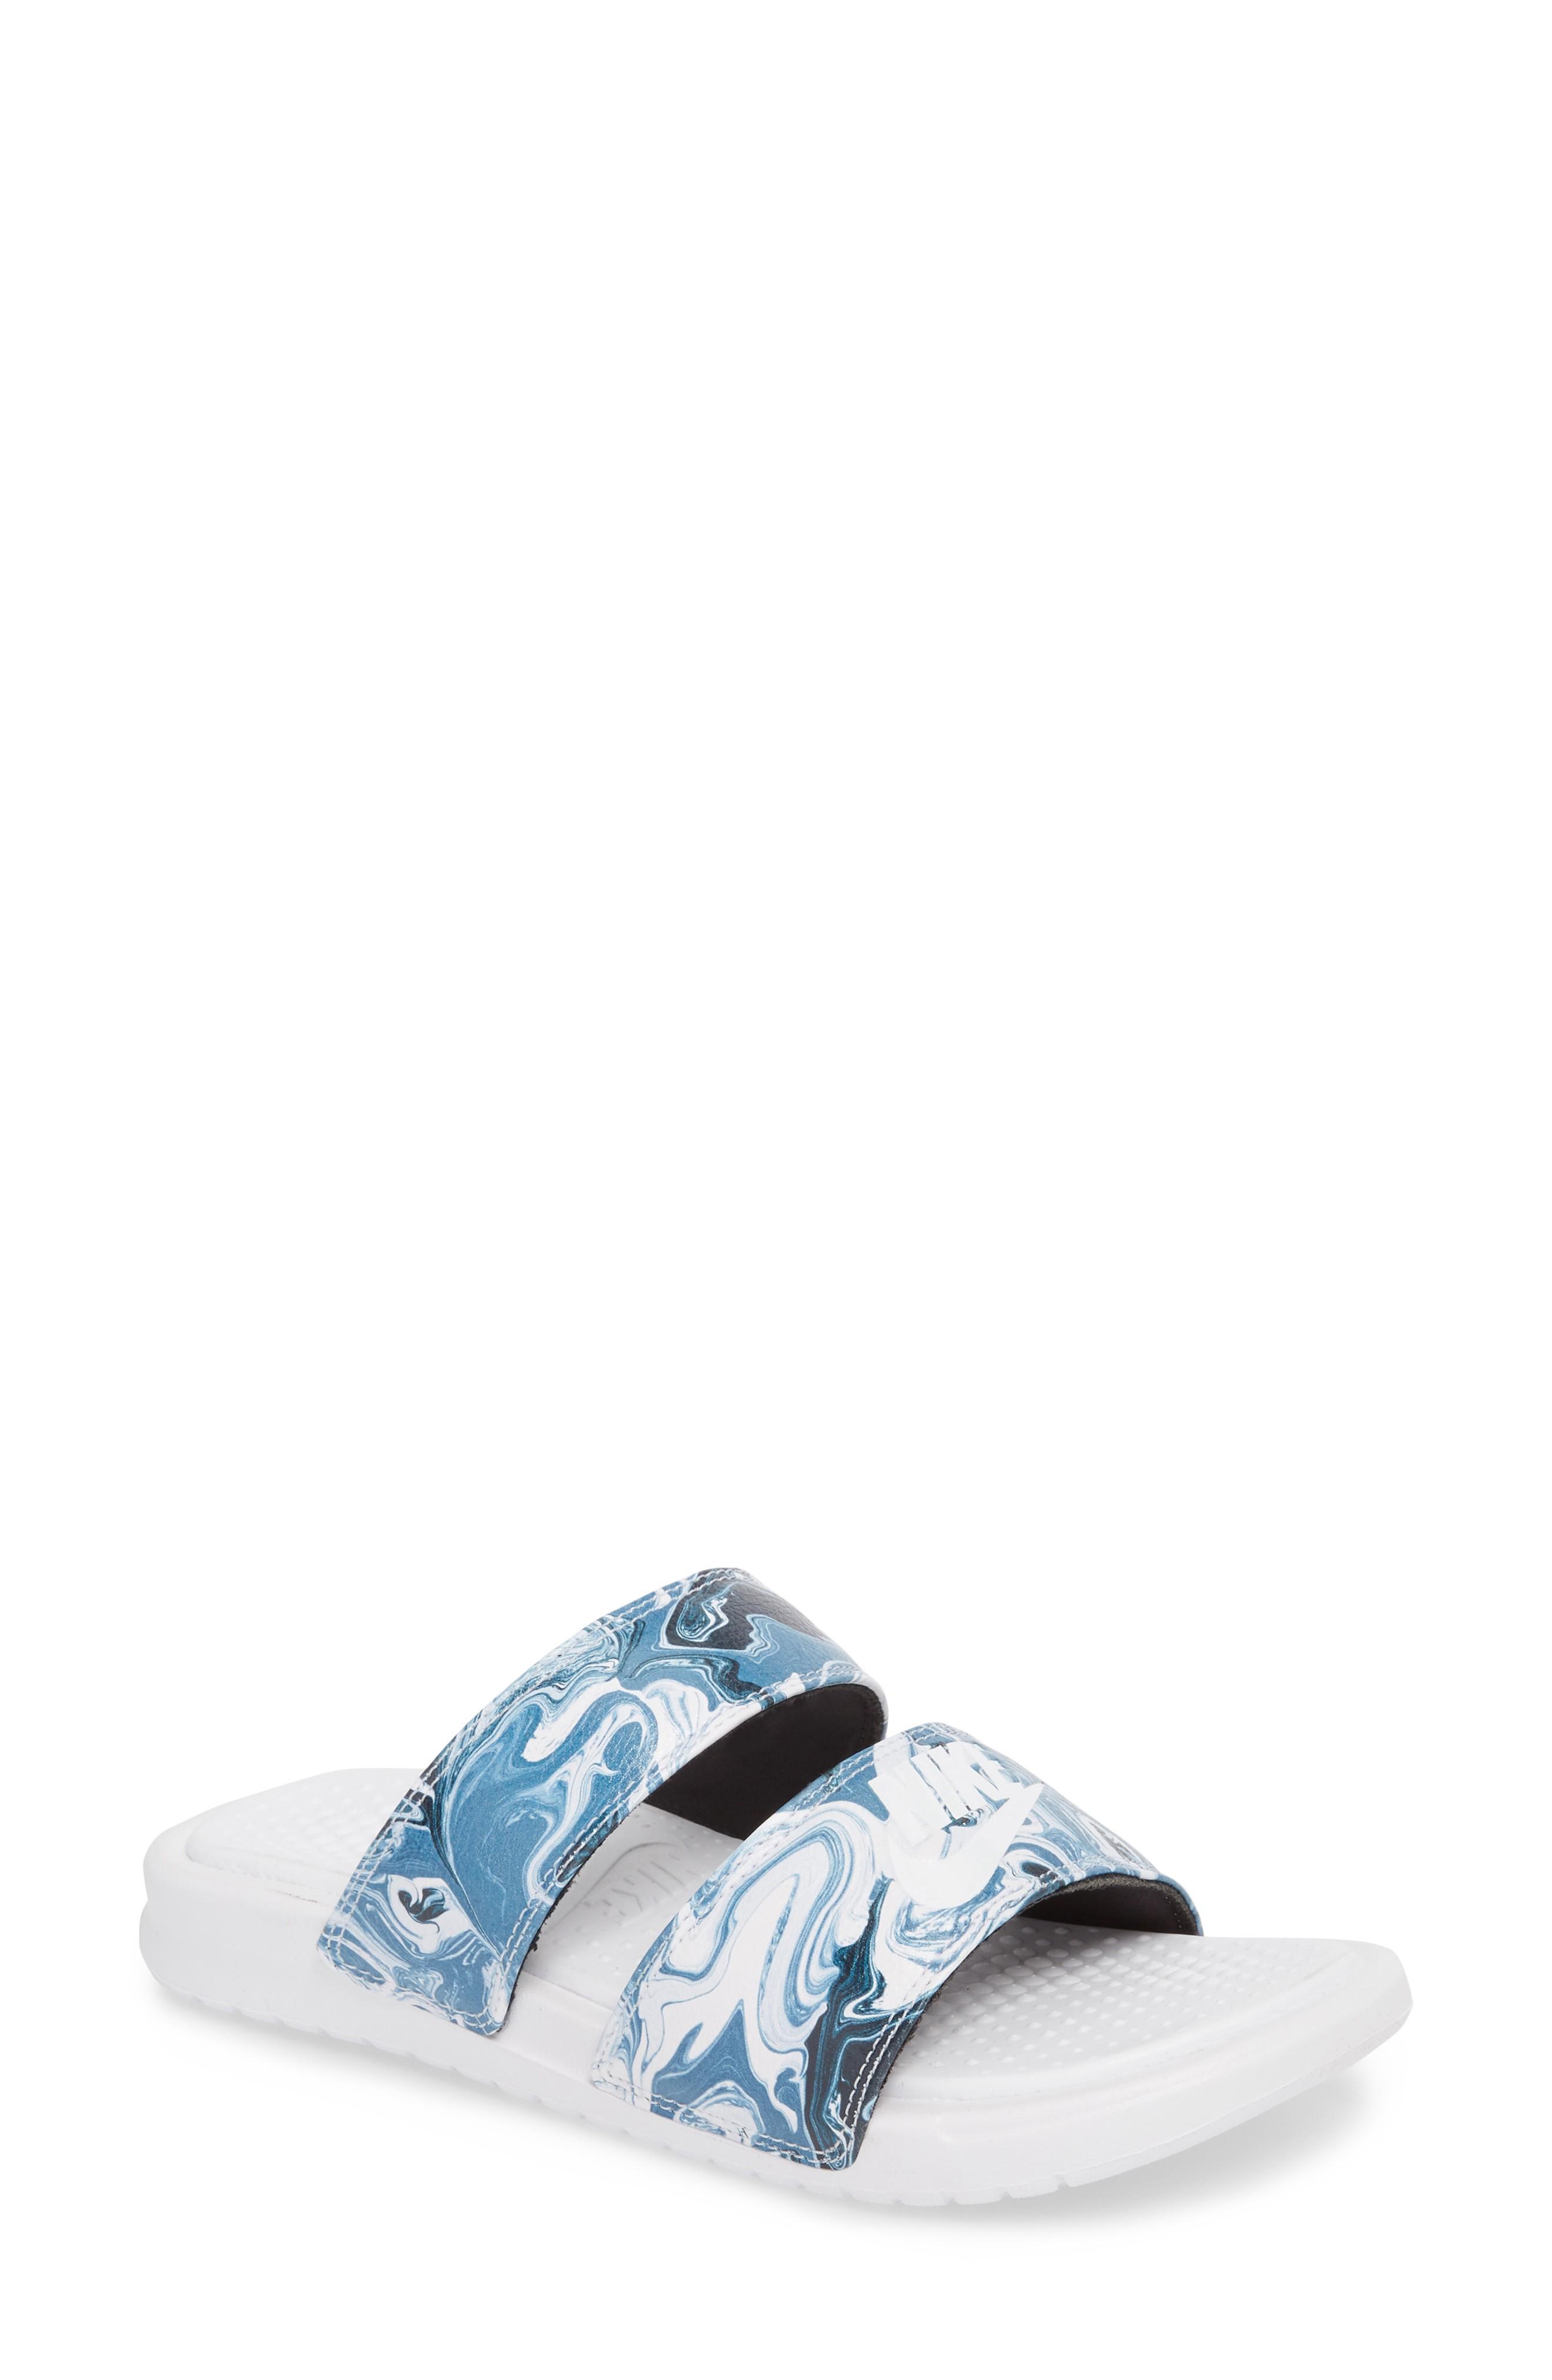 26ef82e3447e Nike Women s Benassi Duo Ultra Slide Sandals